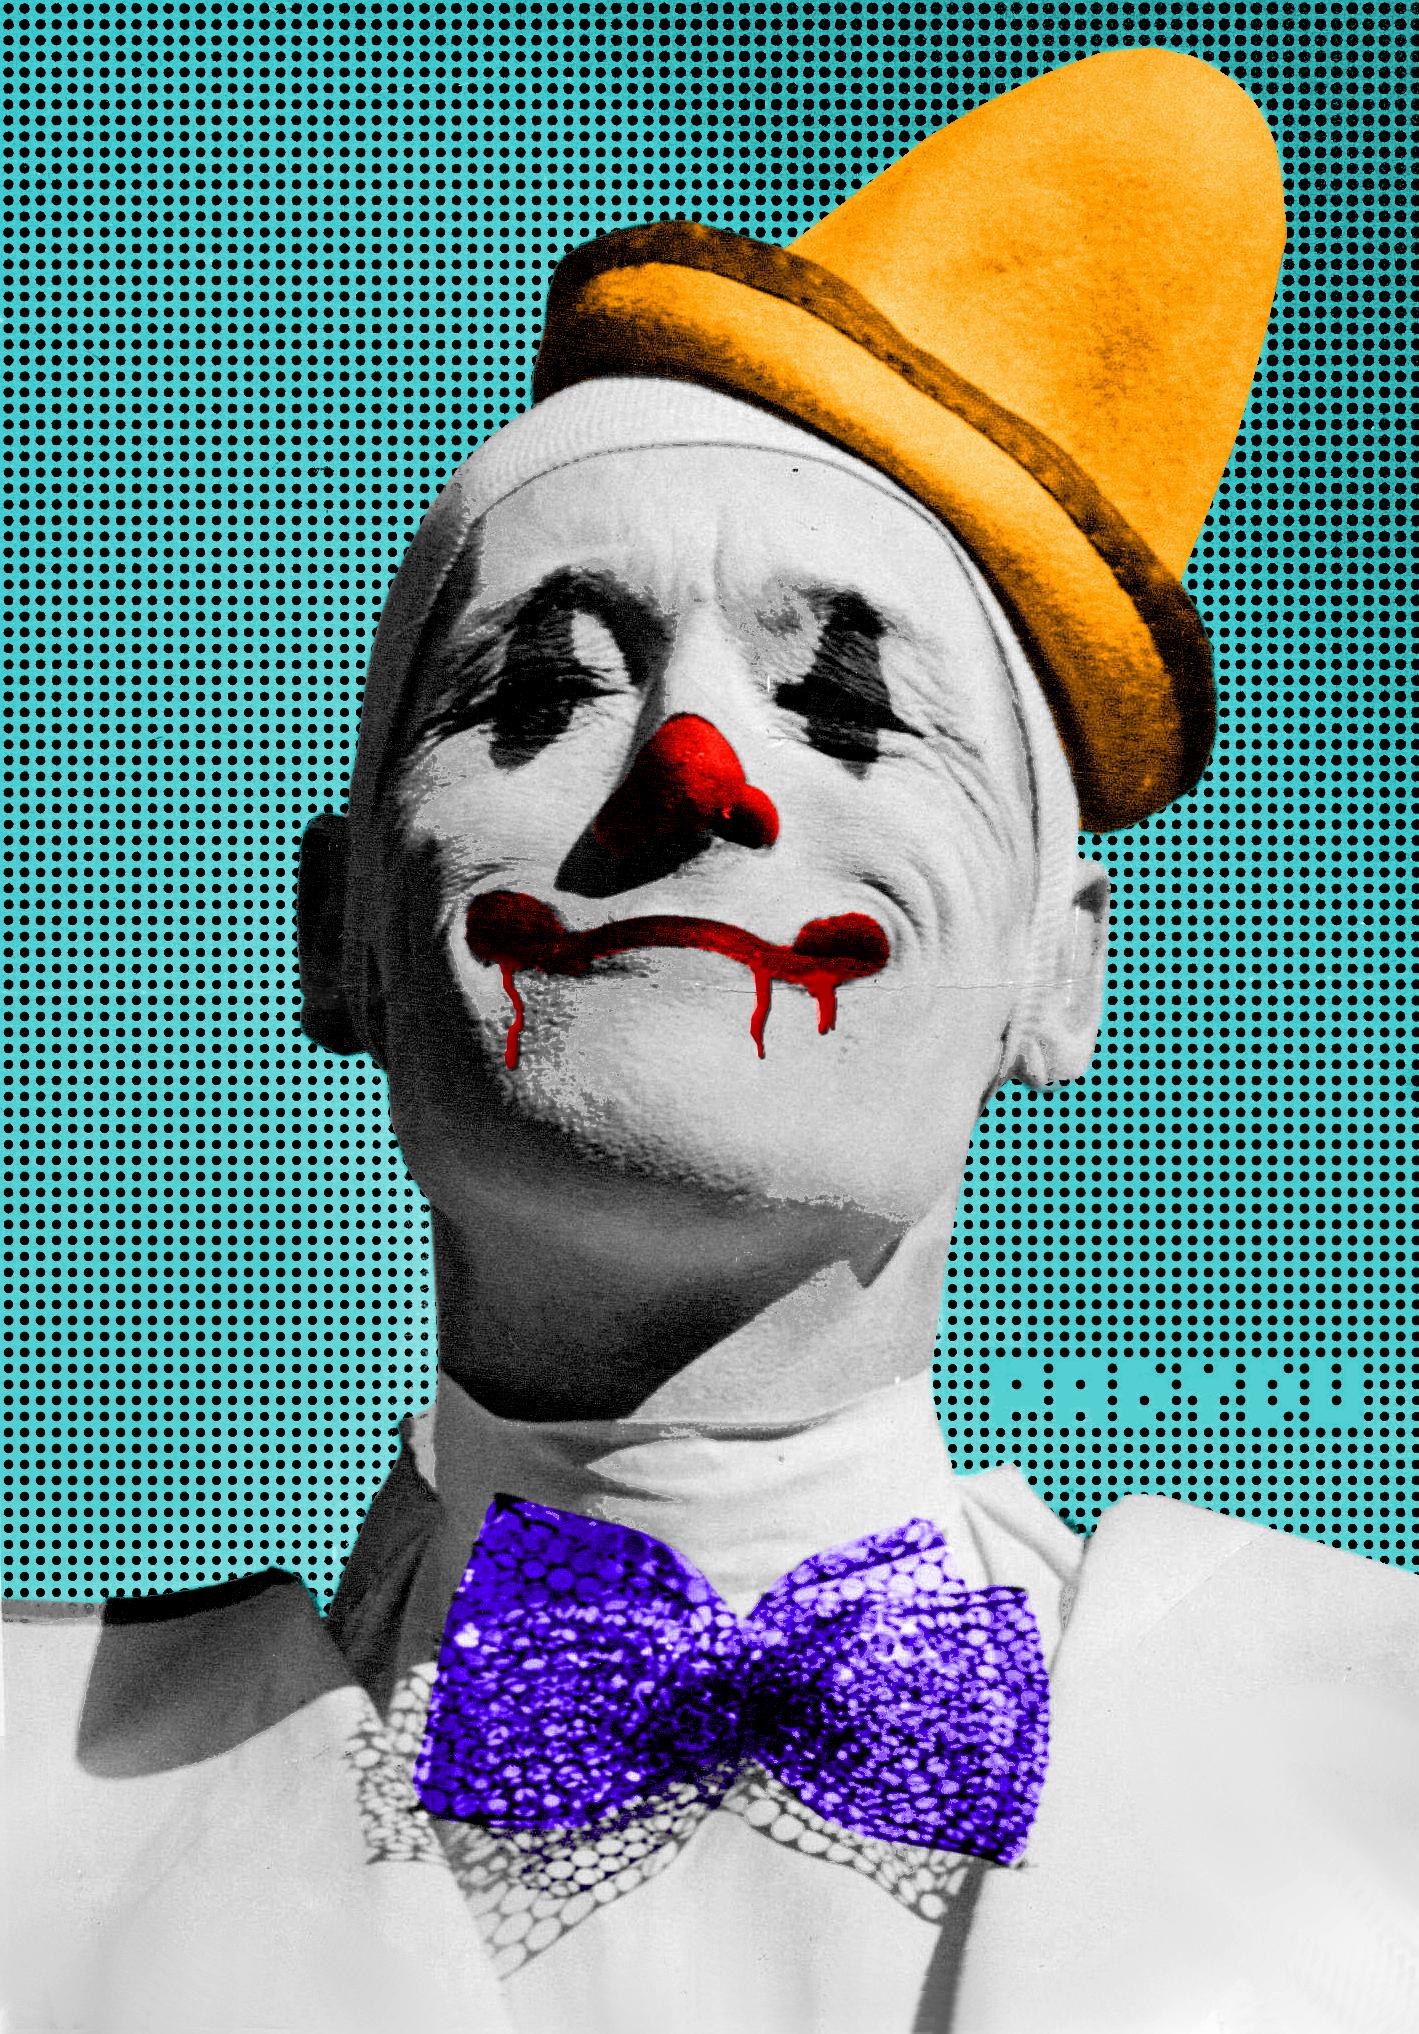 Radical Clown by PADYBU